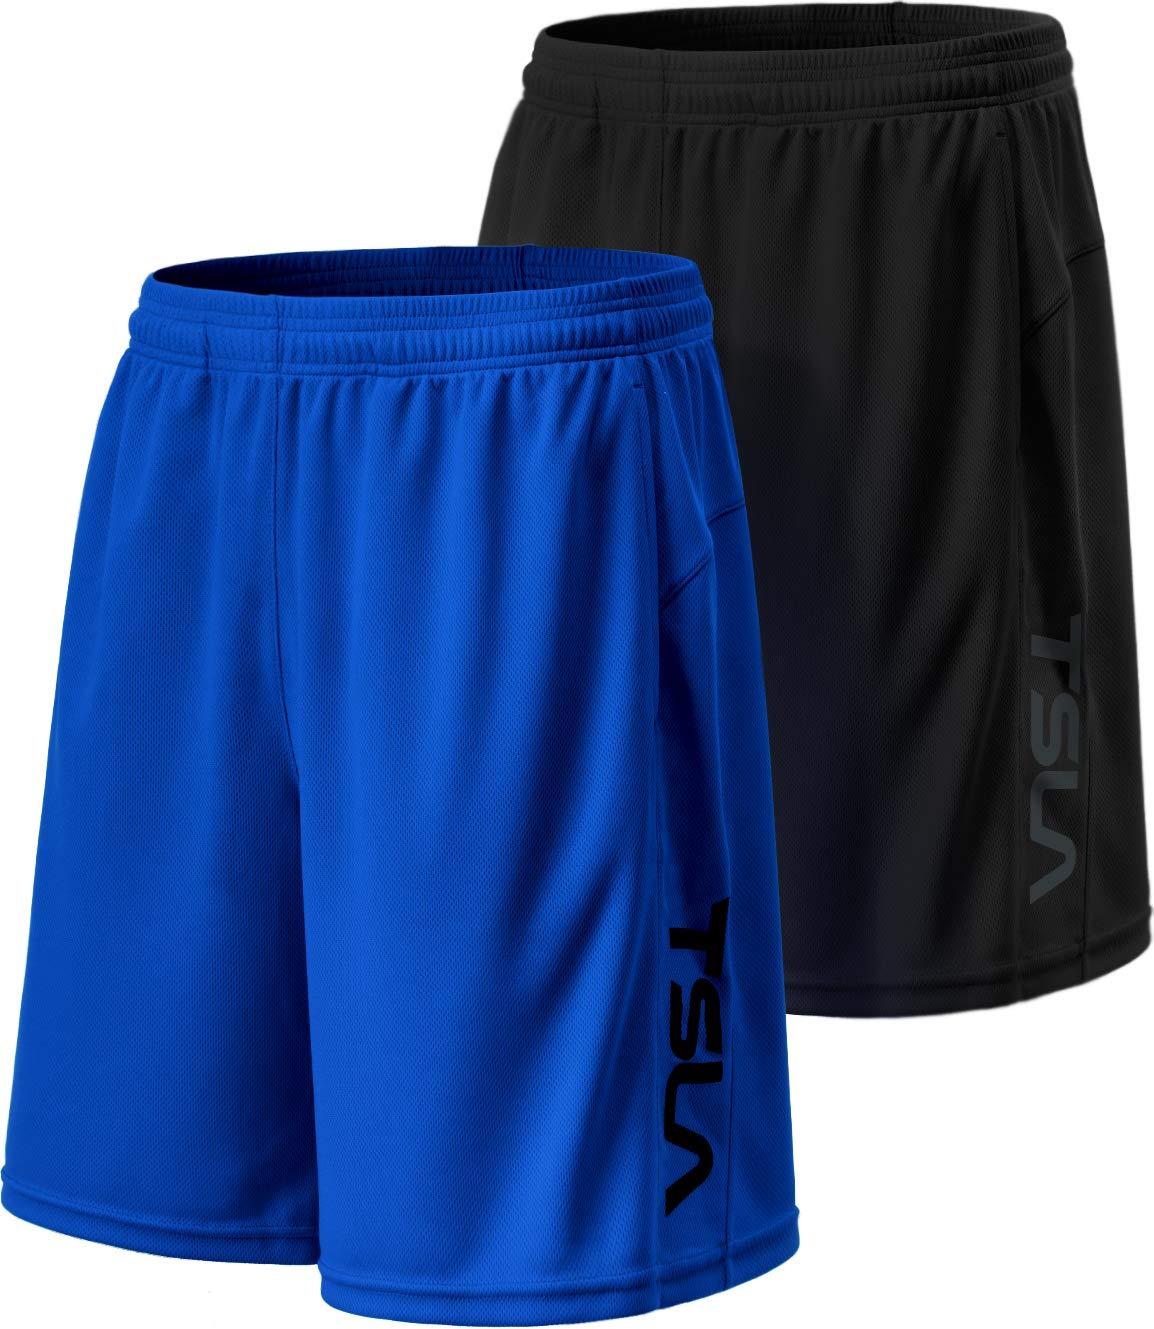 TSLA Men's HyperDri Cool Quick-Dry Active Lightweight Workout Performance Shorts (Pack of 2), Hyper Dri Dual Pack(mbh22) - Black/Blue, Small